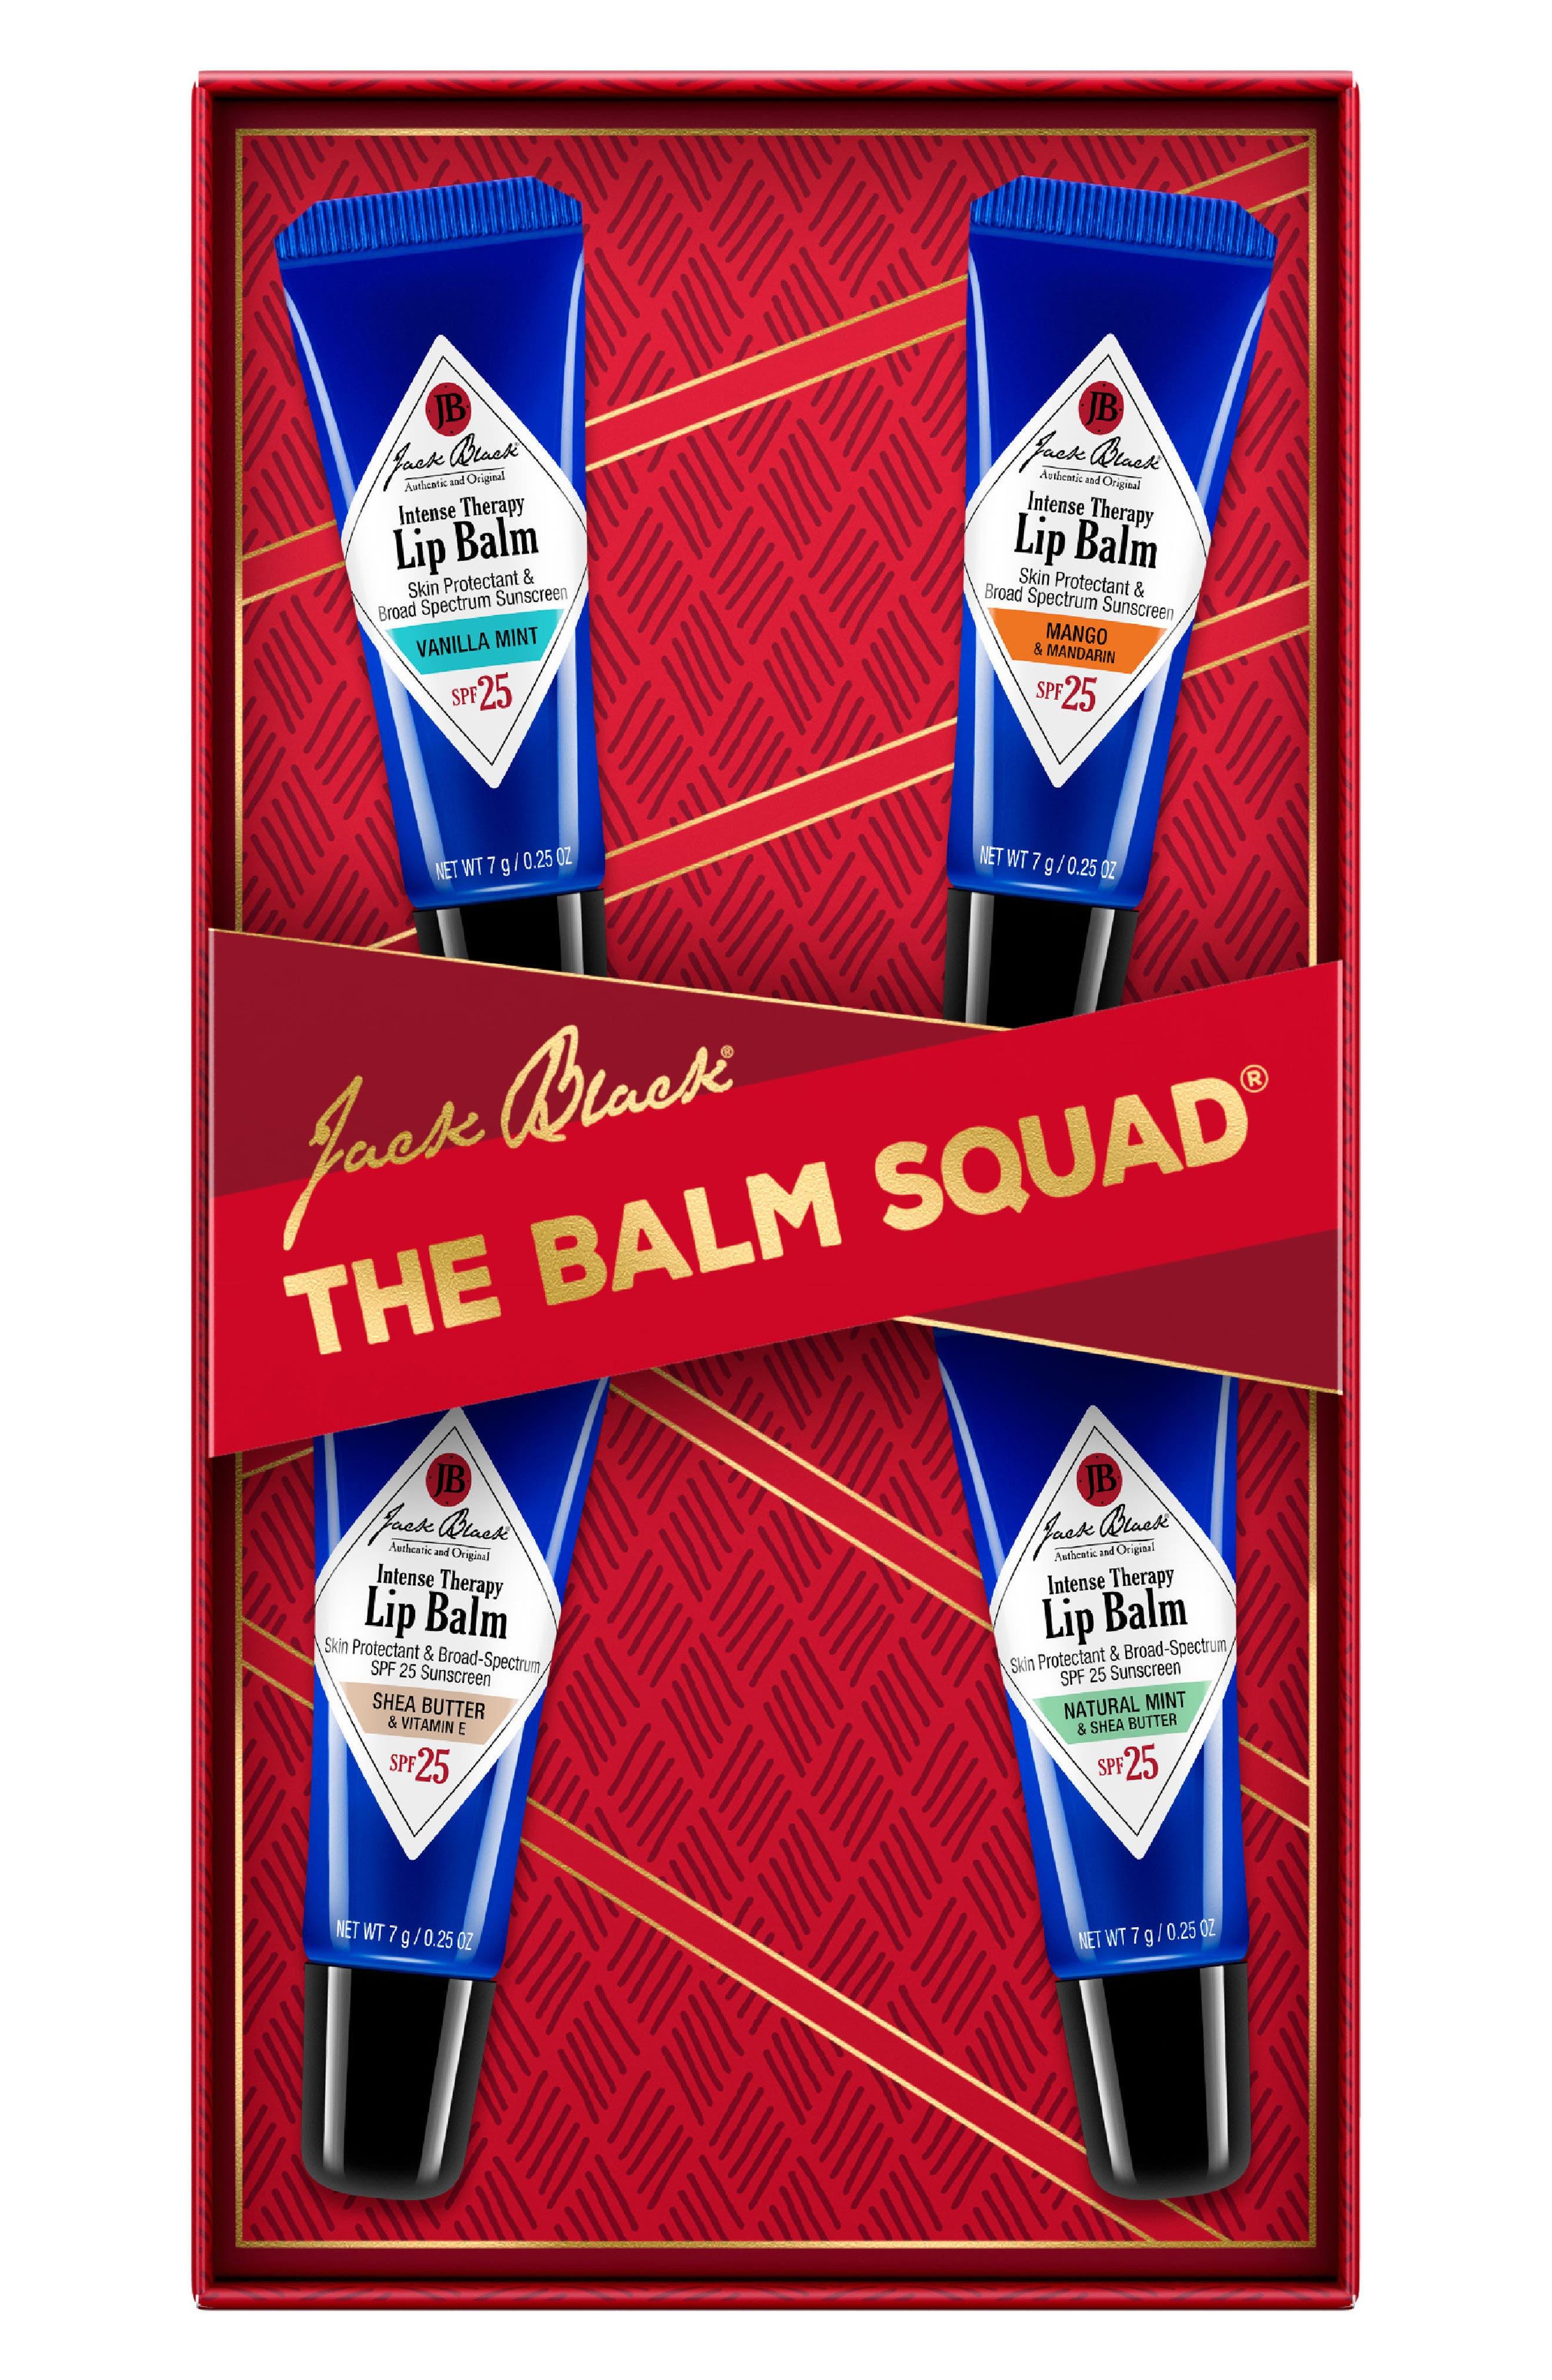 Jack Black The Balm Squad Set ($30 Value)